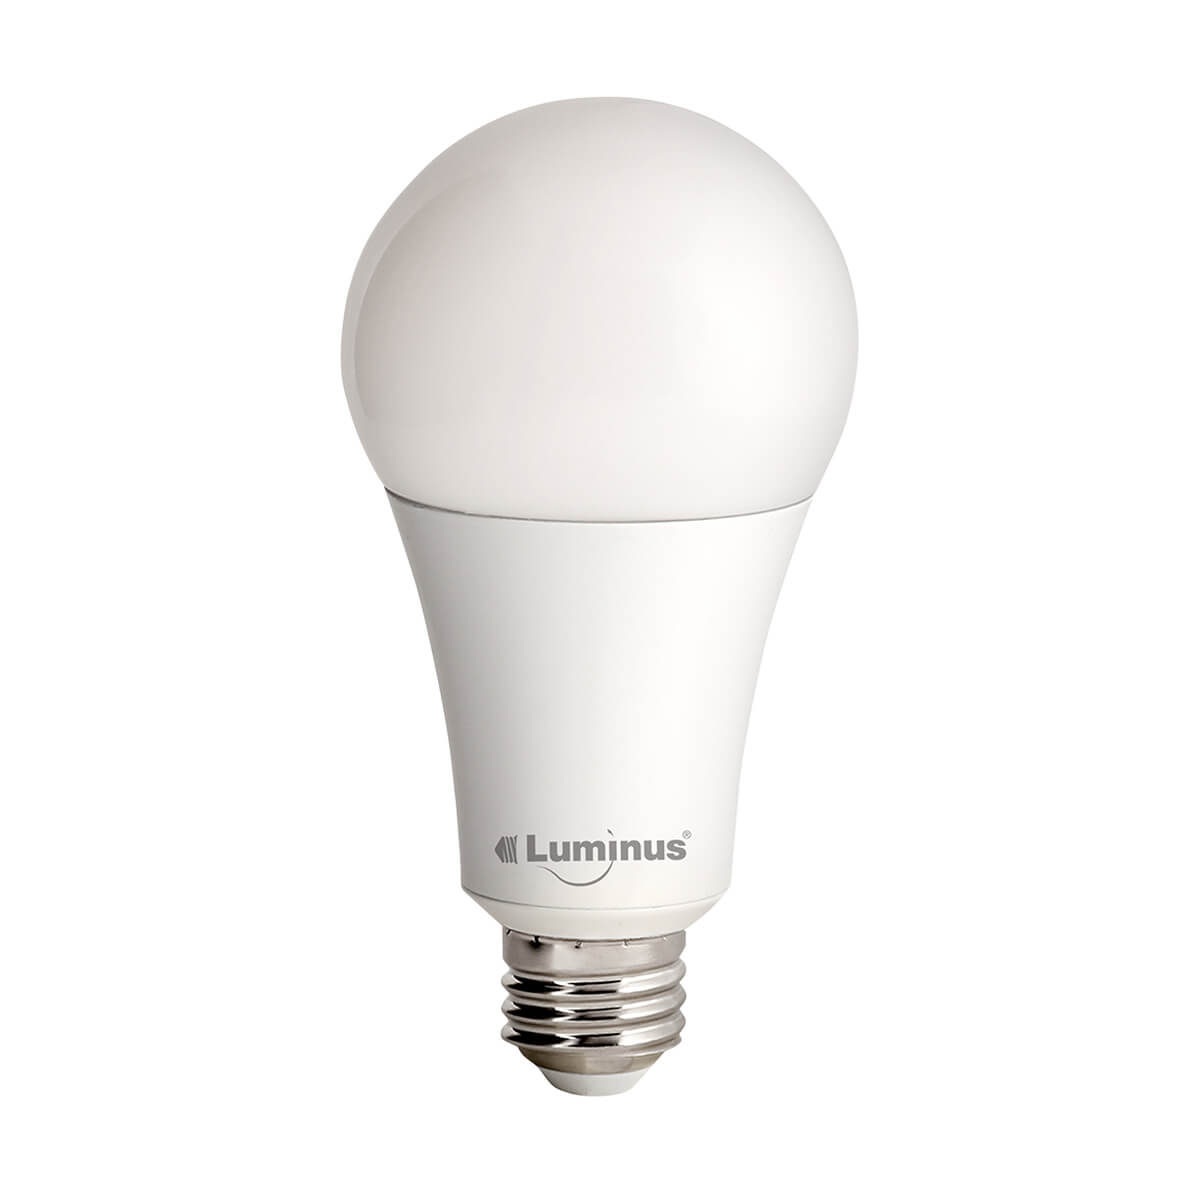 Luminus LED - 15W A19 ND - 2 Pack